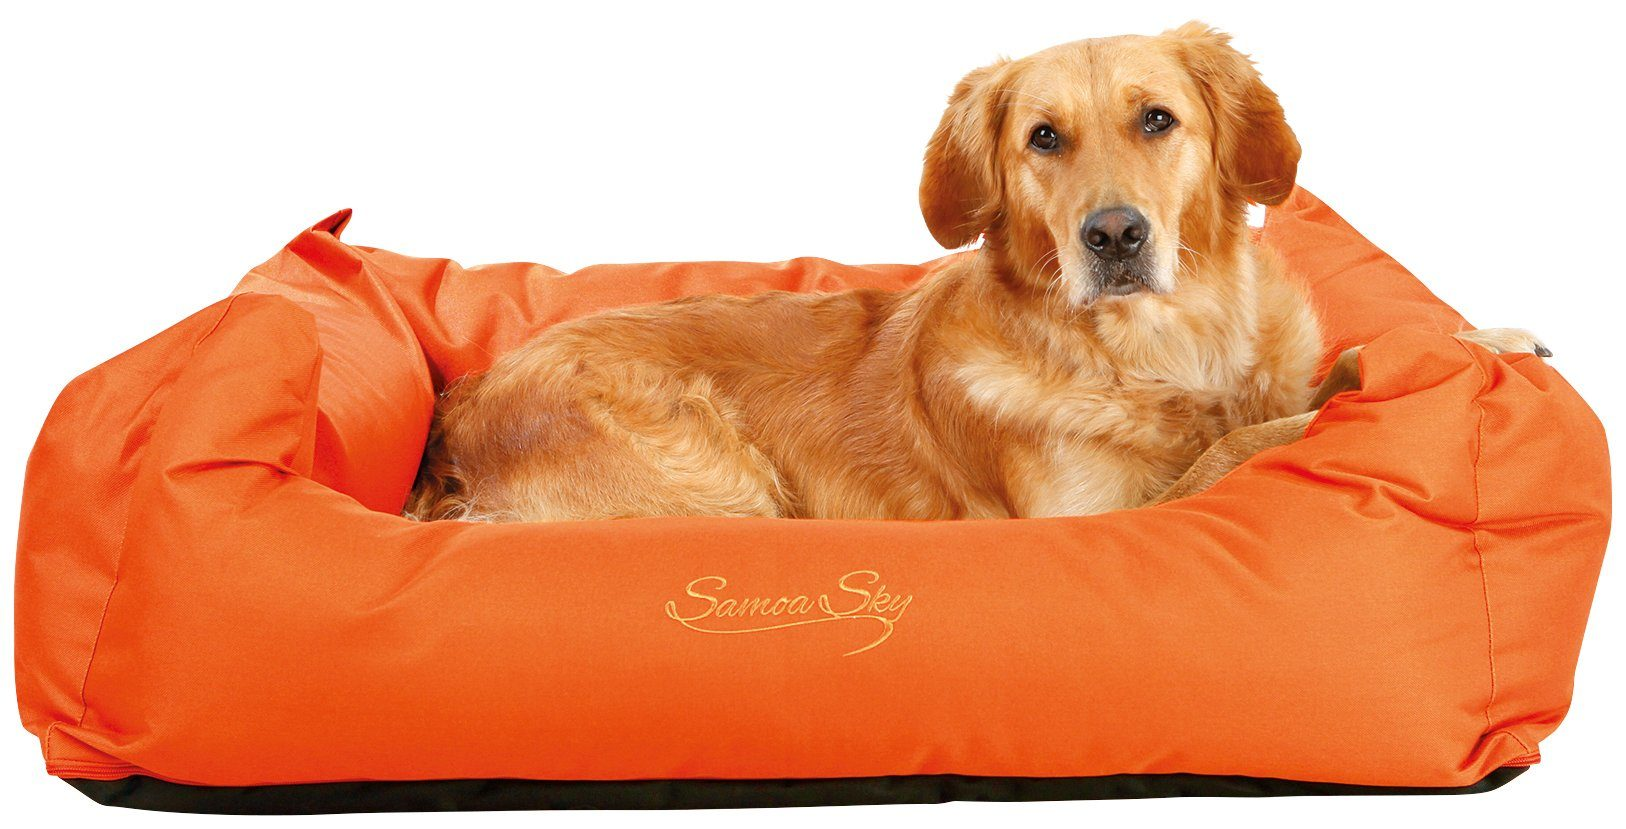 Hunde-Bett »Samoa Sky«, BxL: 65x50 cm, orange